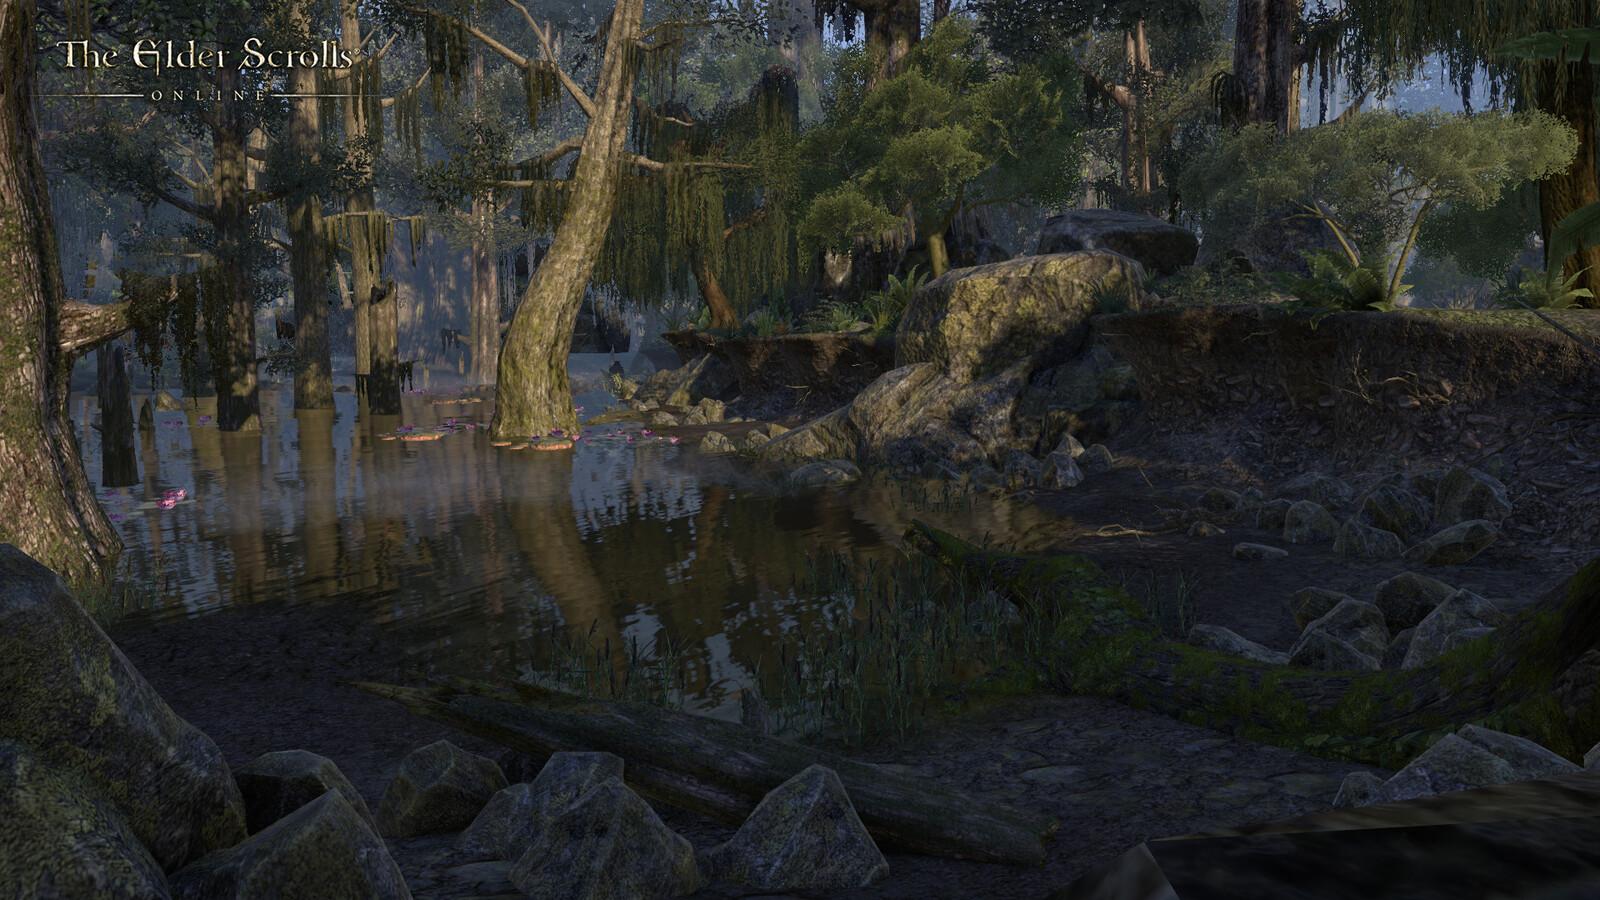 World building alpha pocket created for Elder Scrolls Online. All scene building and lighting done by myself.